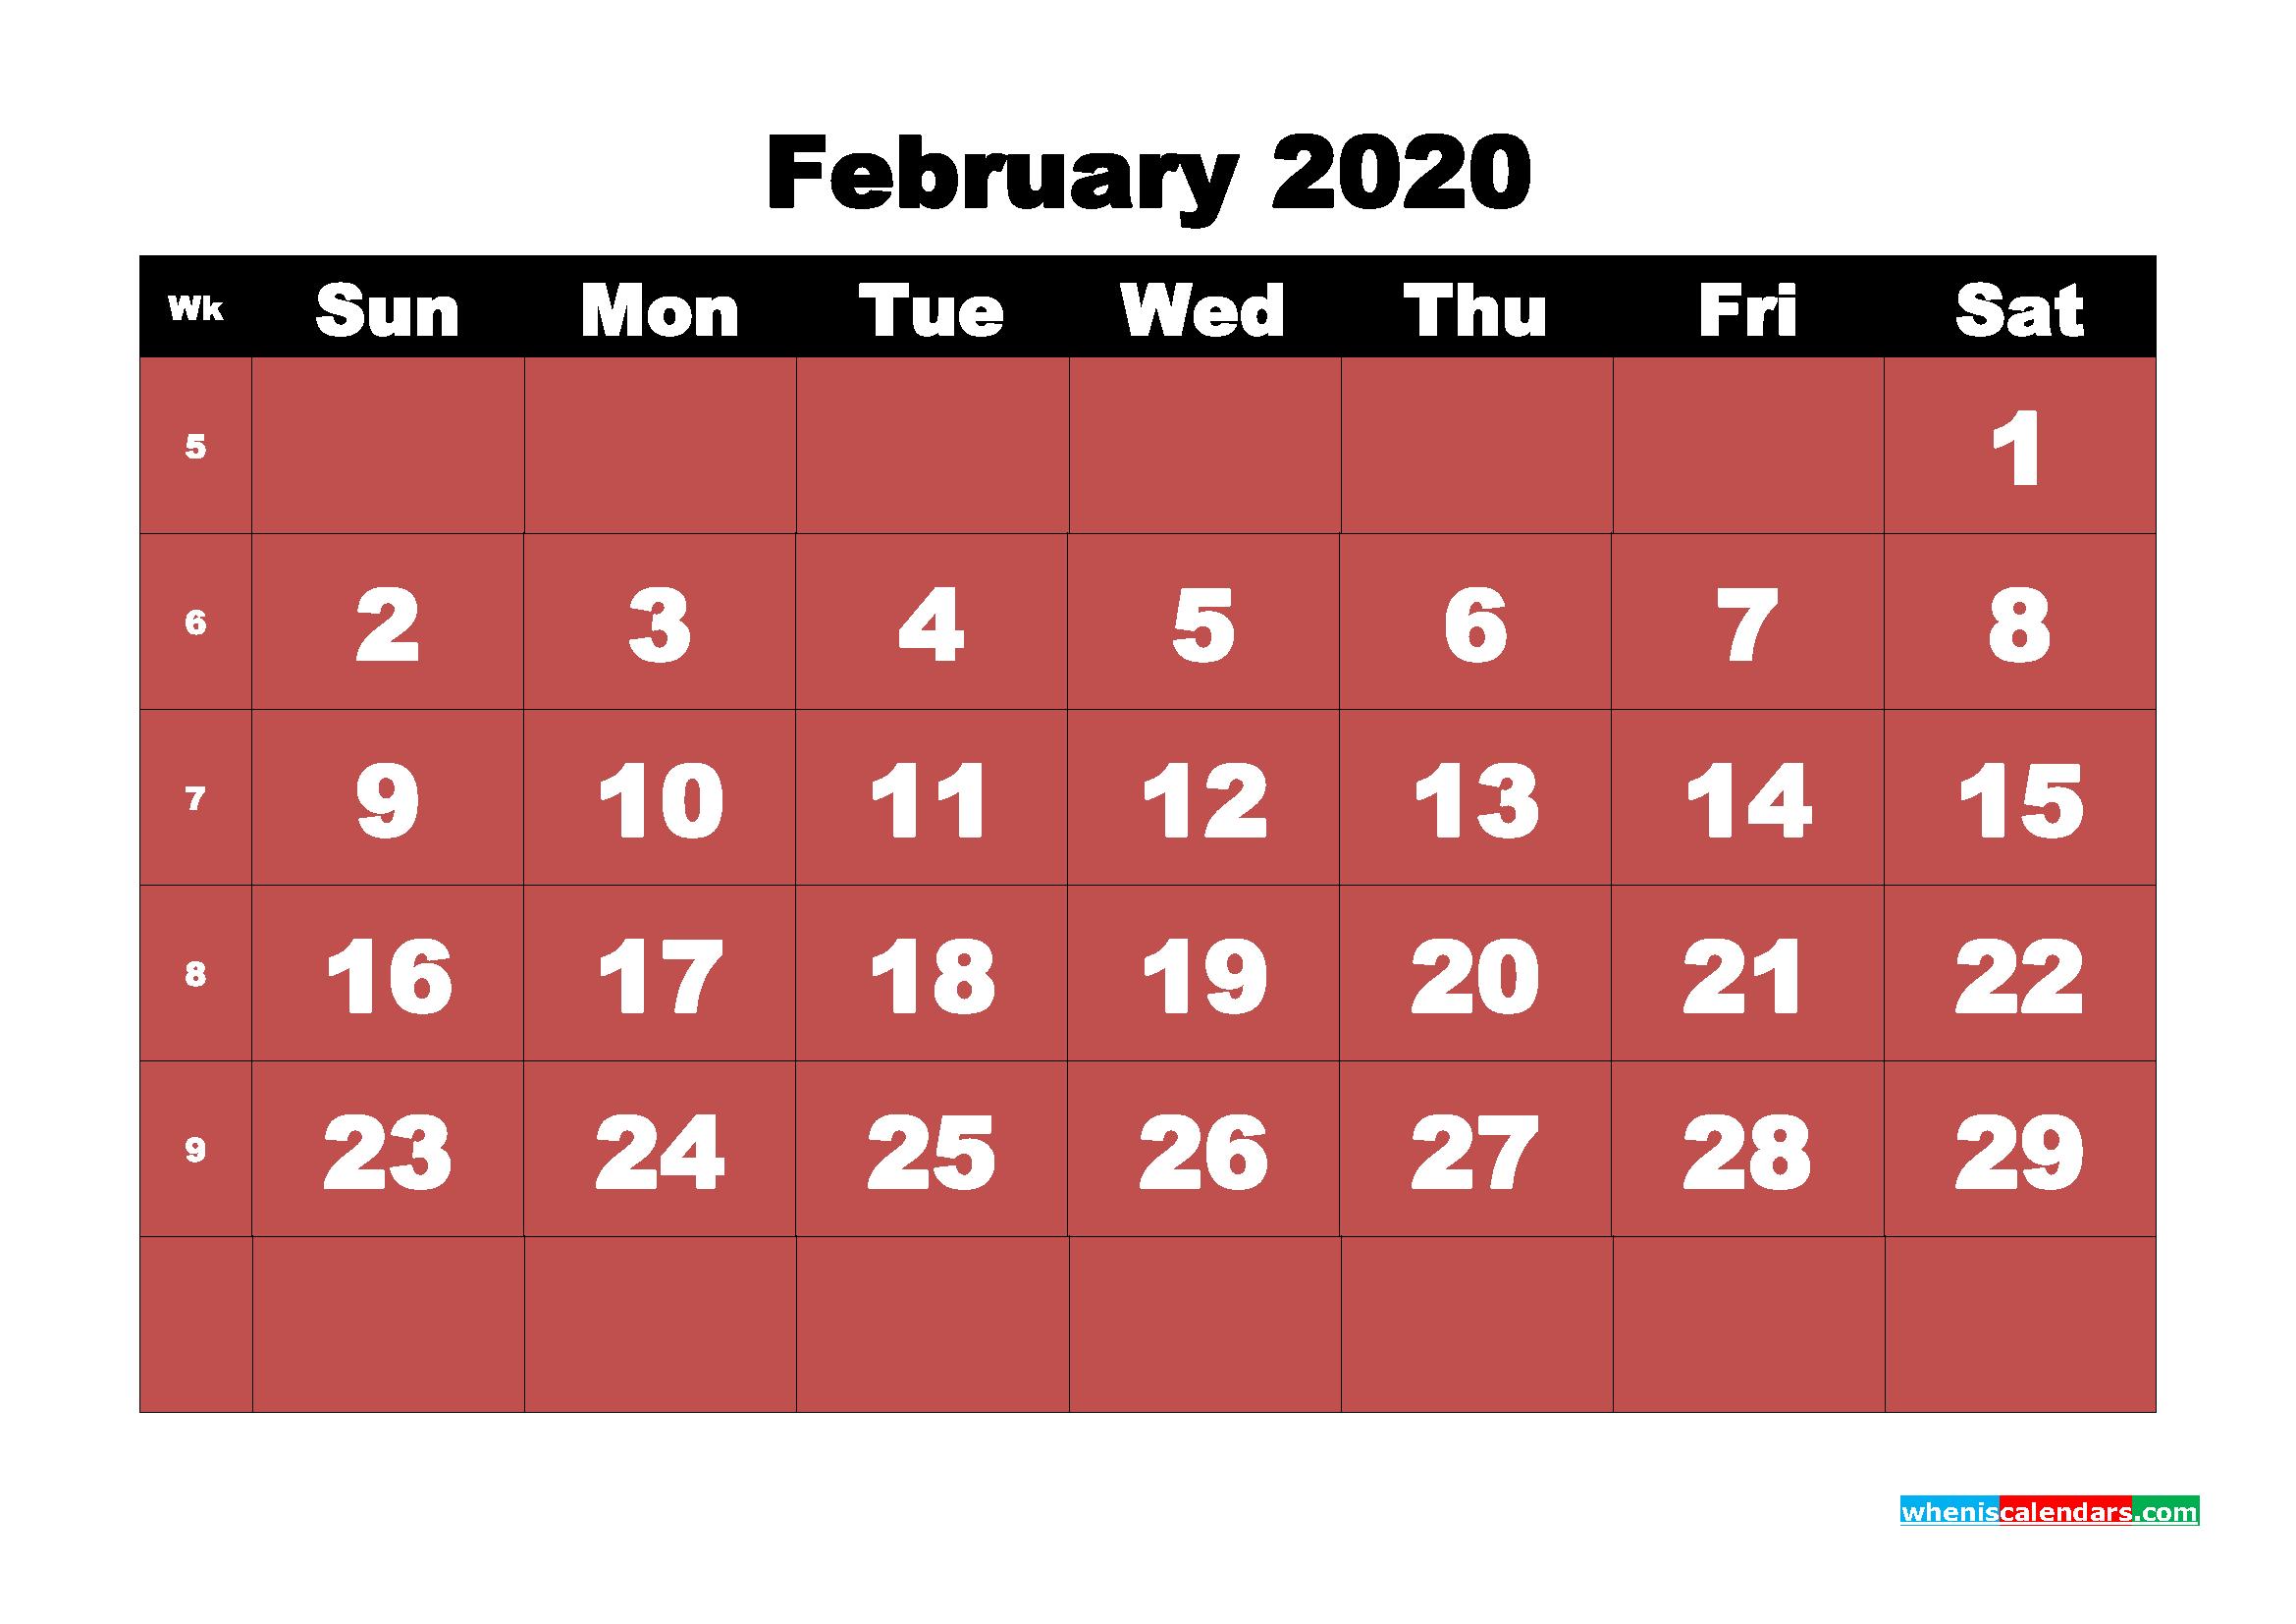 February Printable Calendar 2020 PDF, Word - No.m20b14